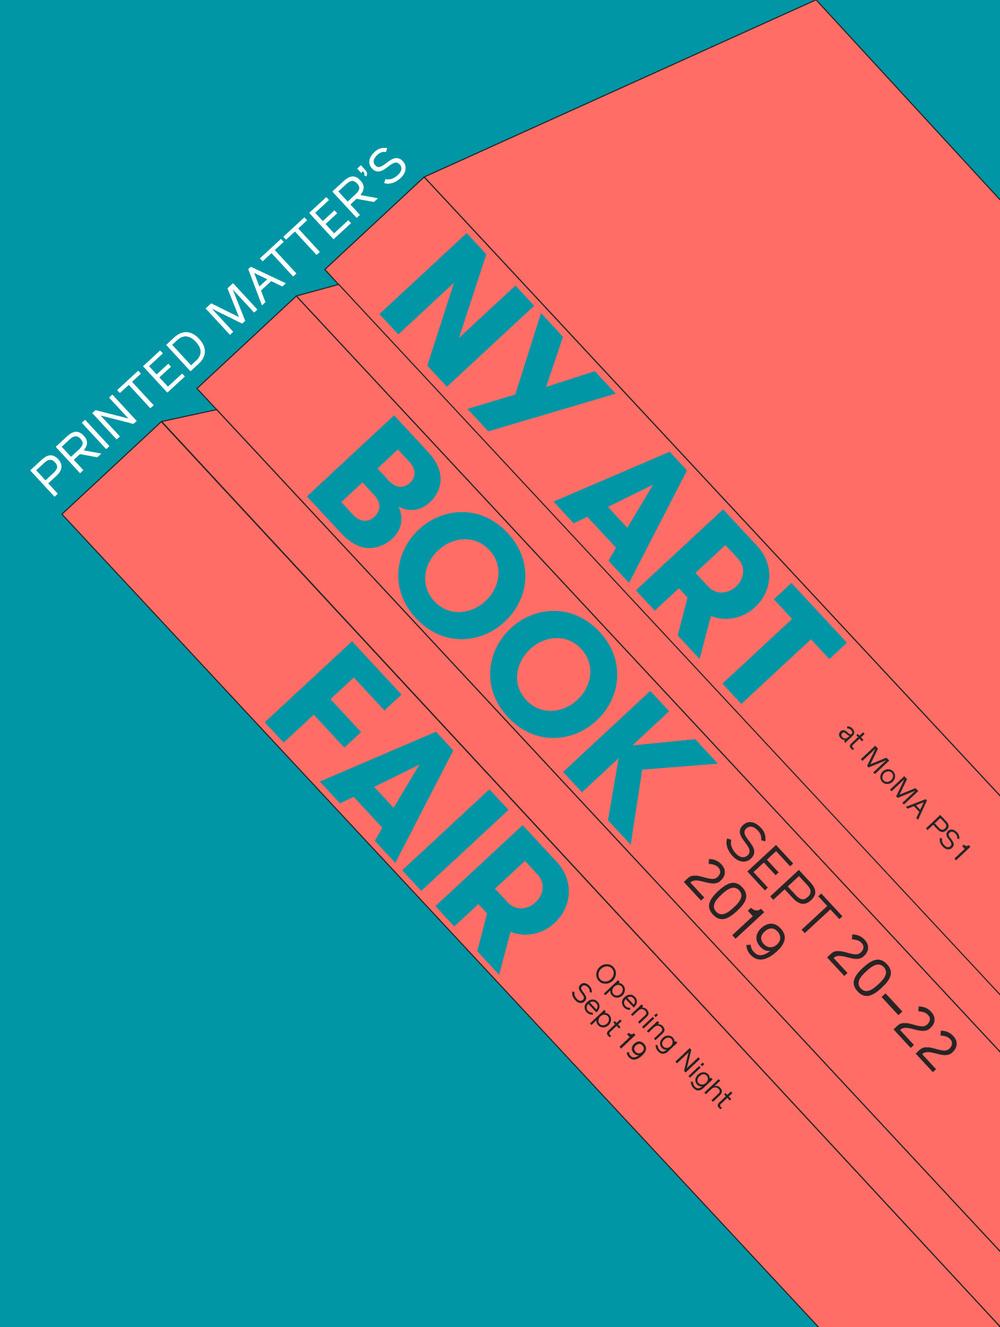 PrintedMattersArtBookFairs_2019.jpg